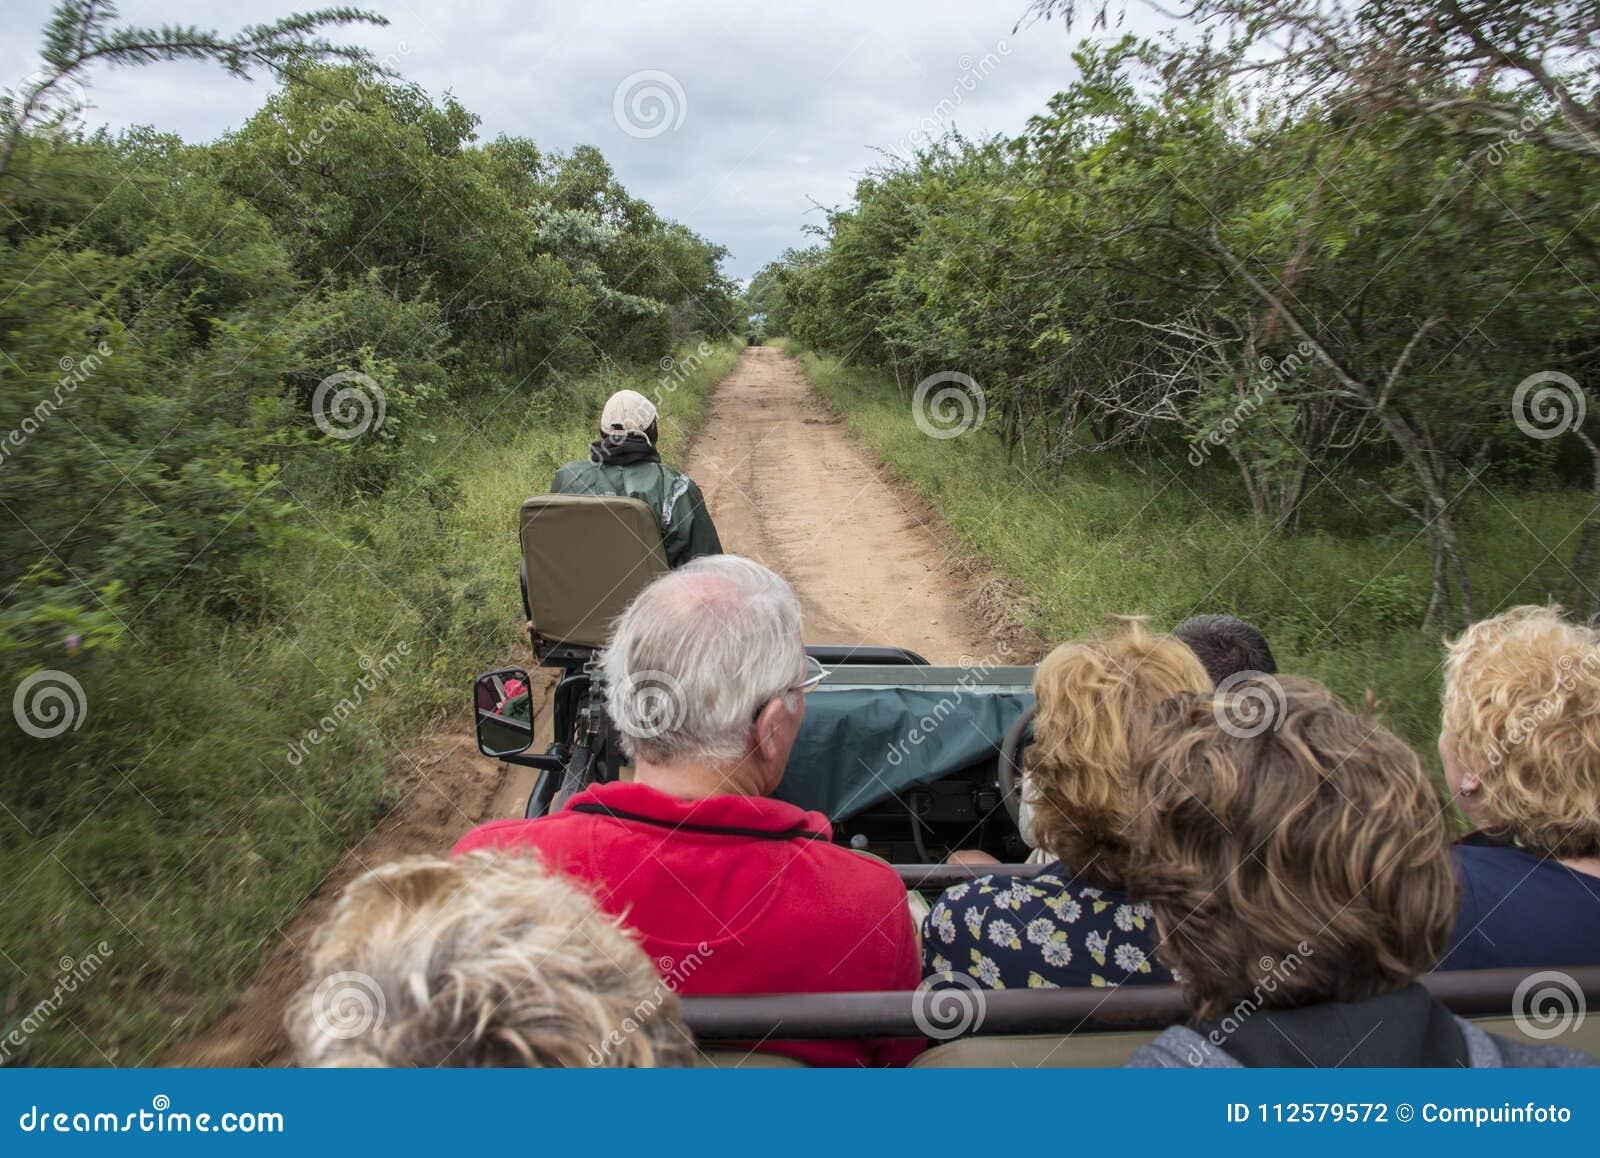 Люди на сафари в Южной Африке